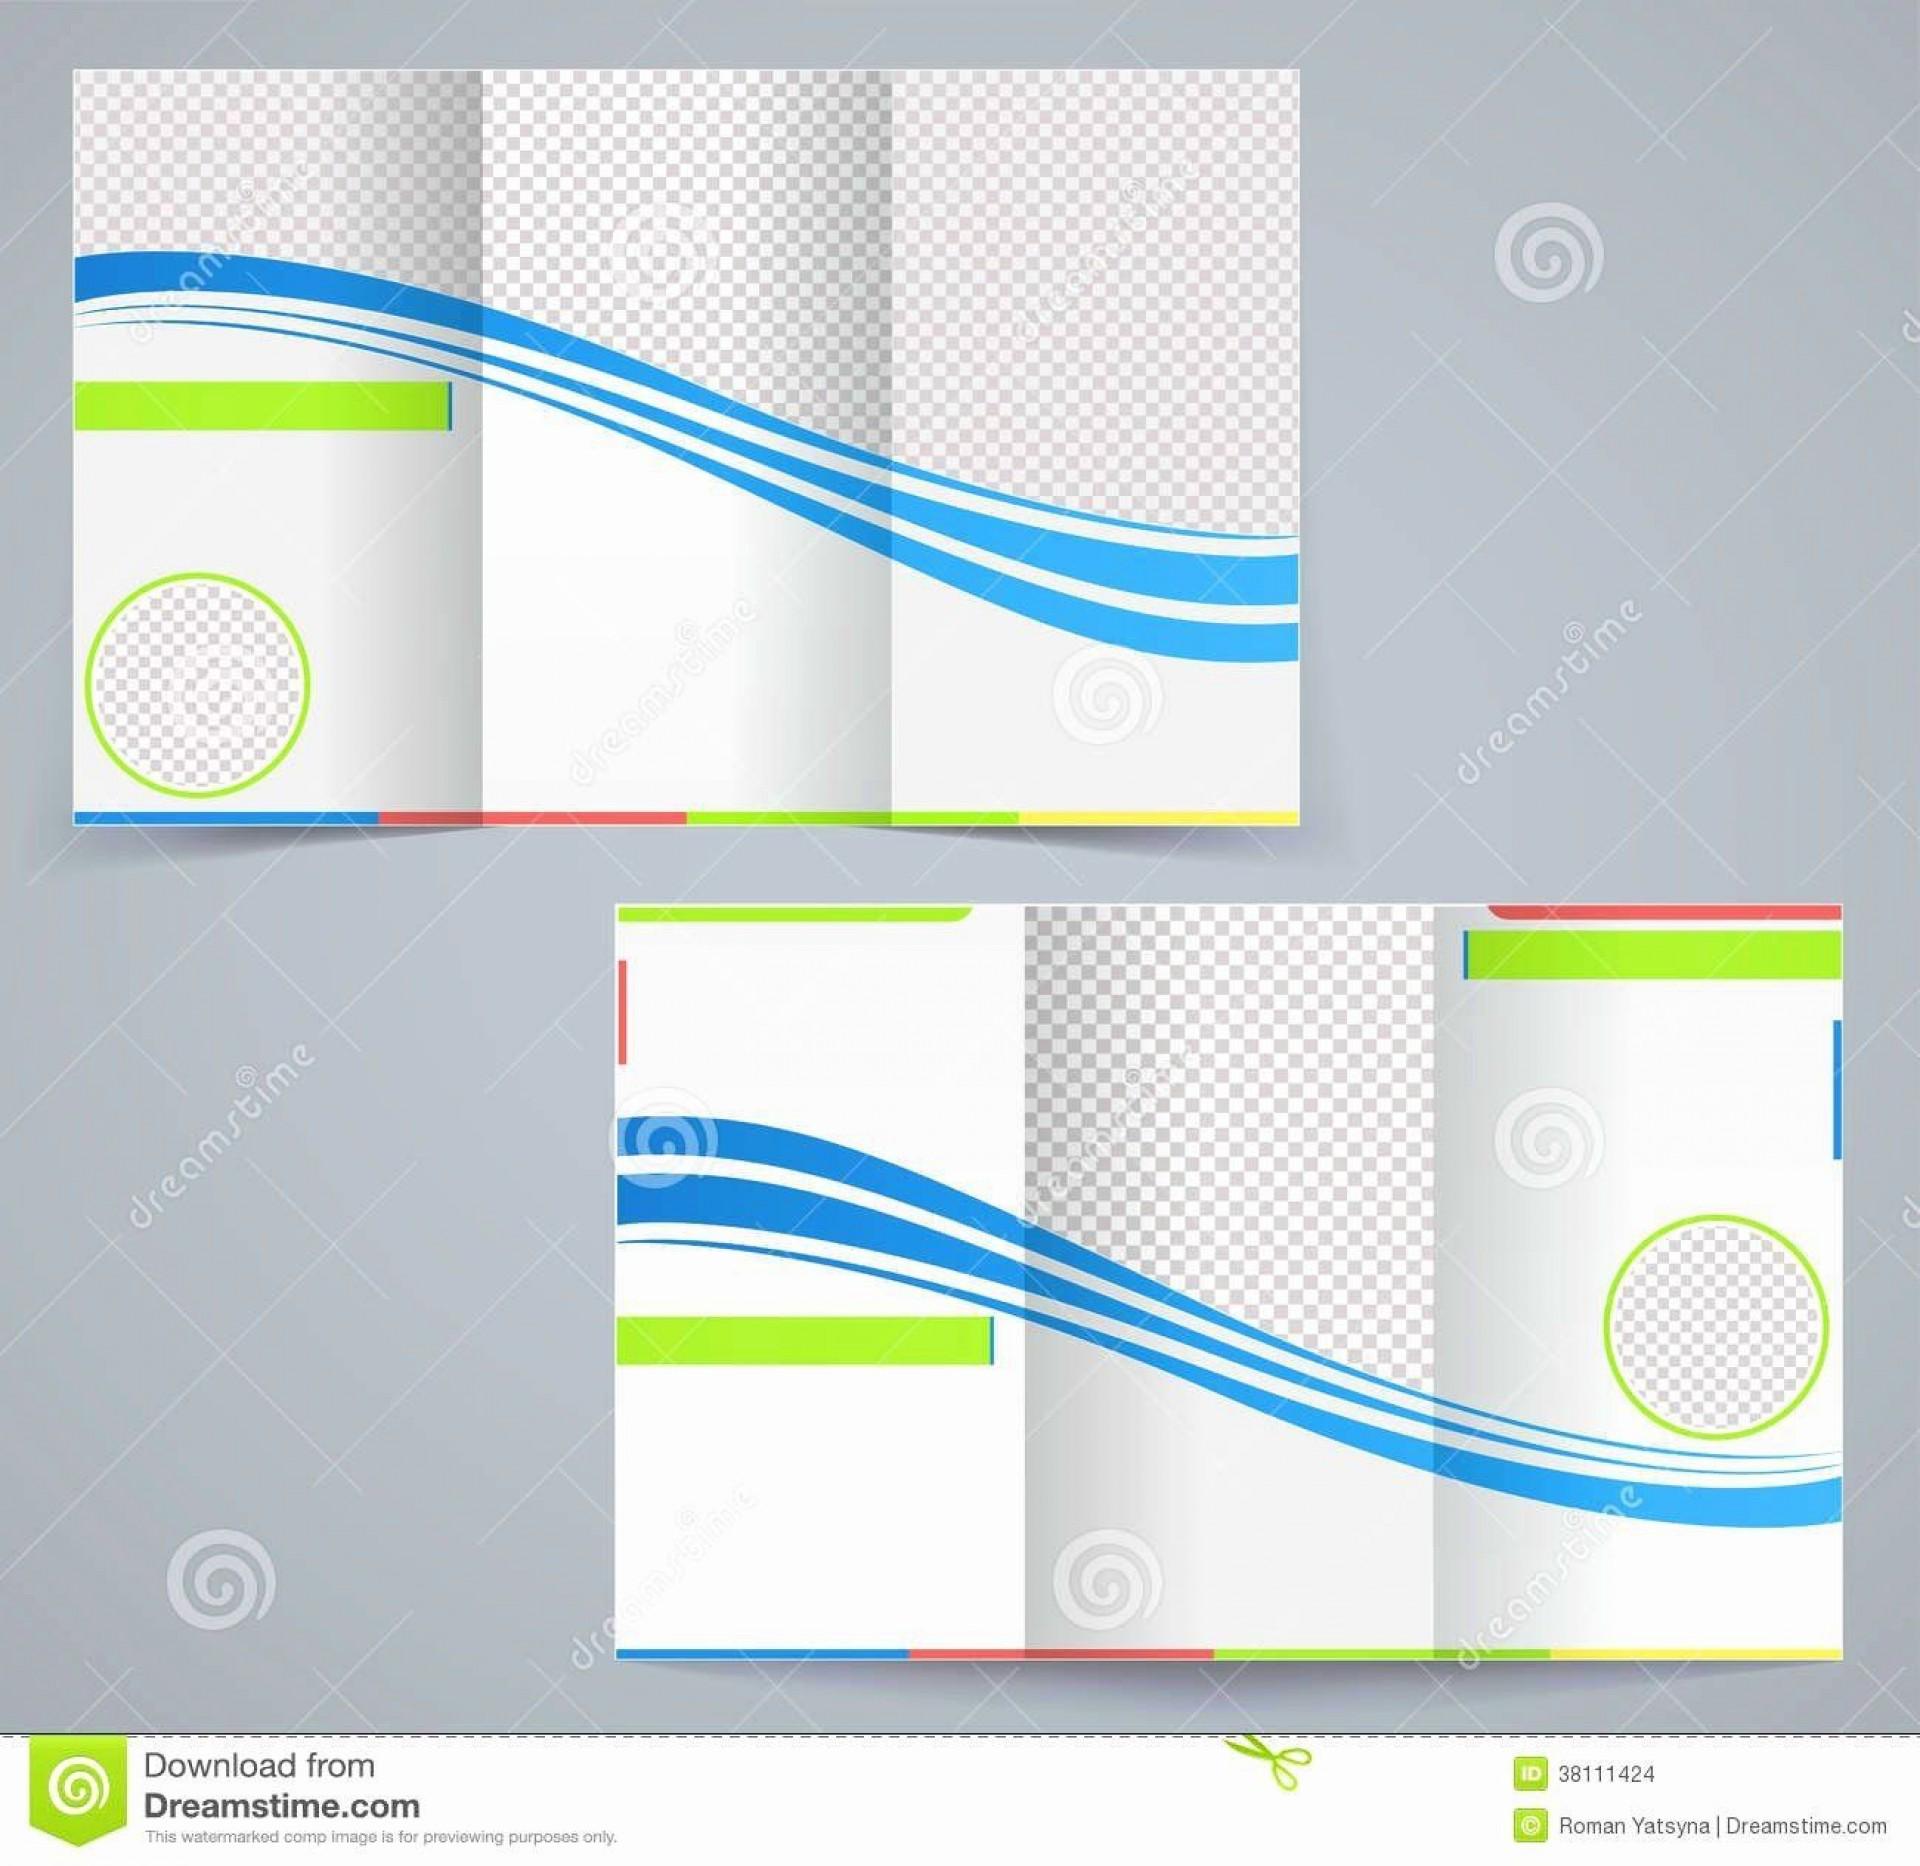 000 Shocking Word Tri Fold Brochure Template Photo  2010 Microsoft M Office1920